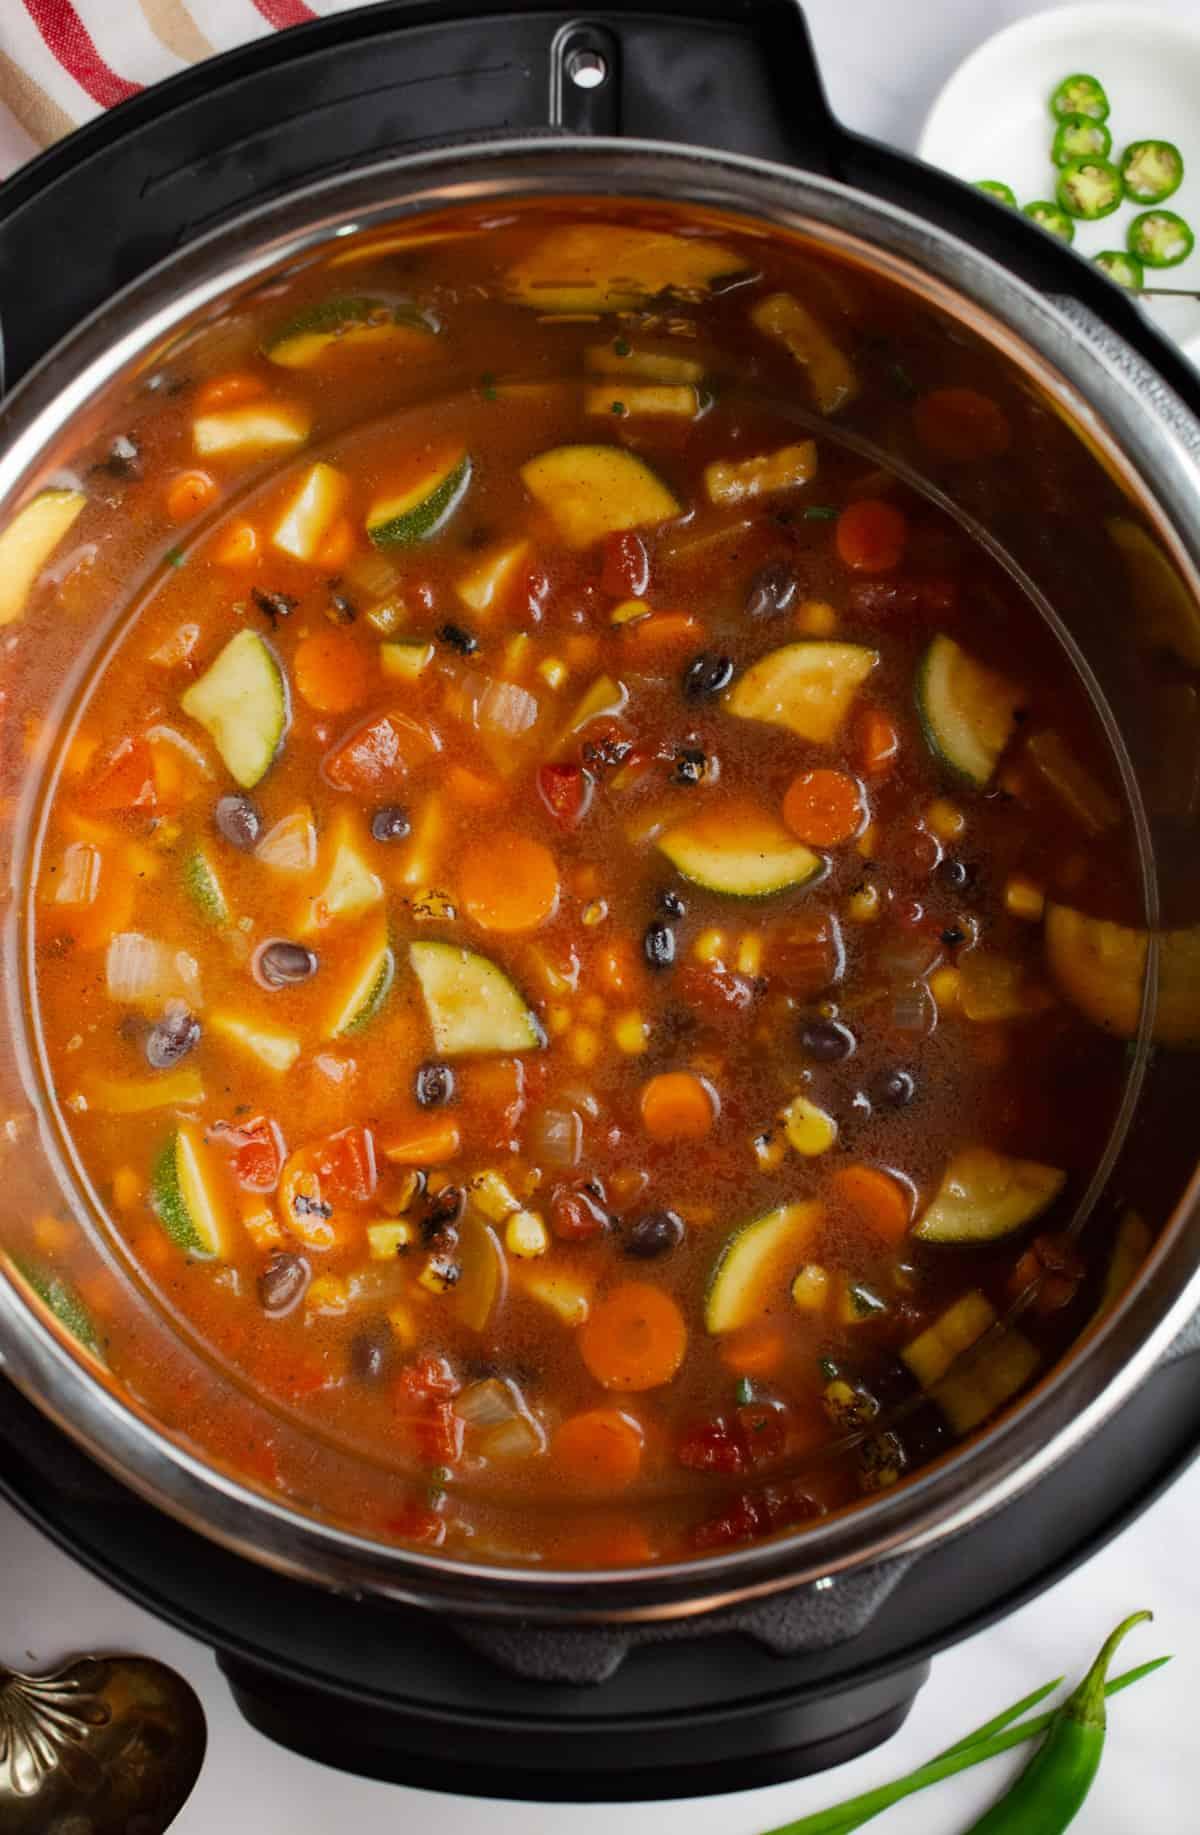 Southwest vegetable soup in an Instant Pot.